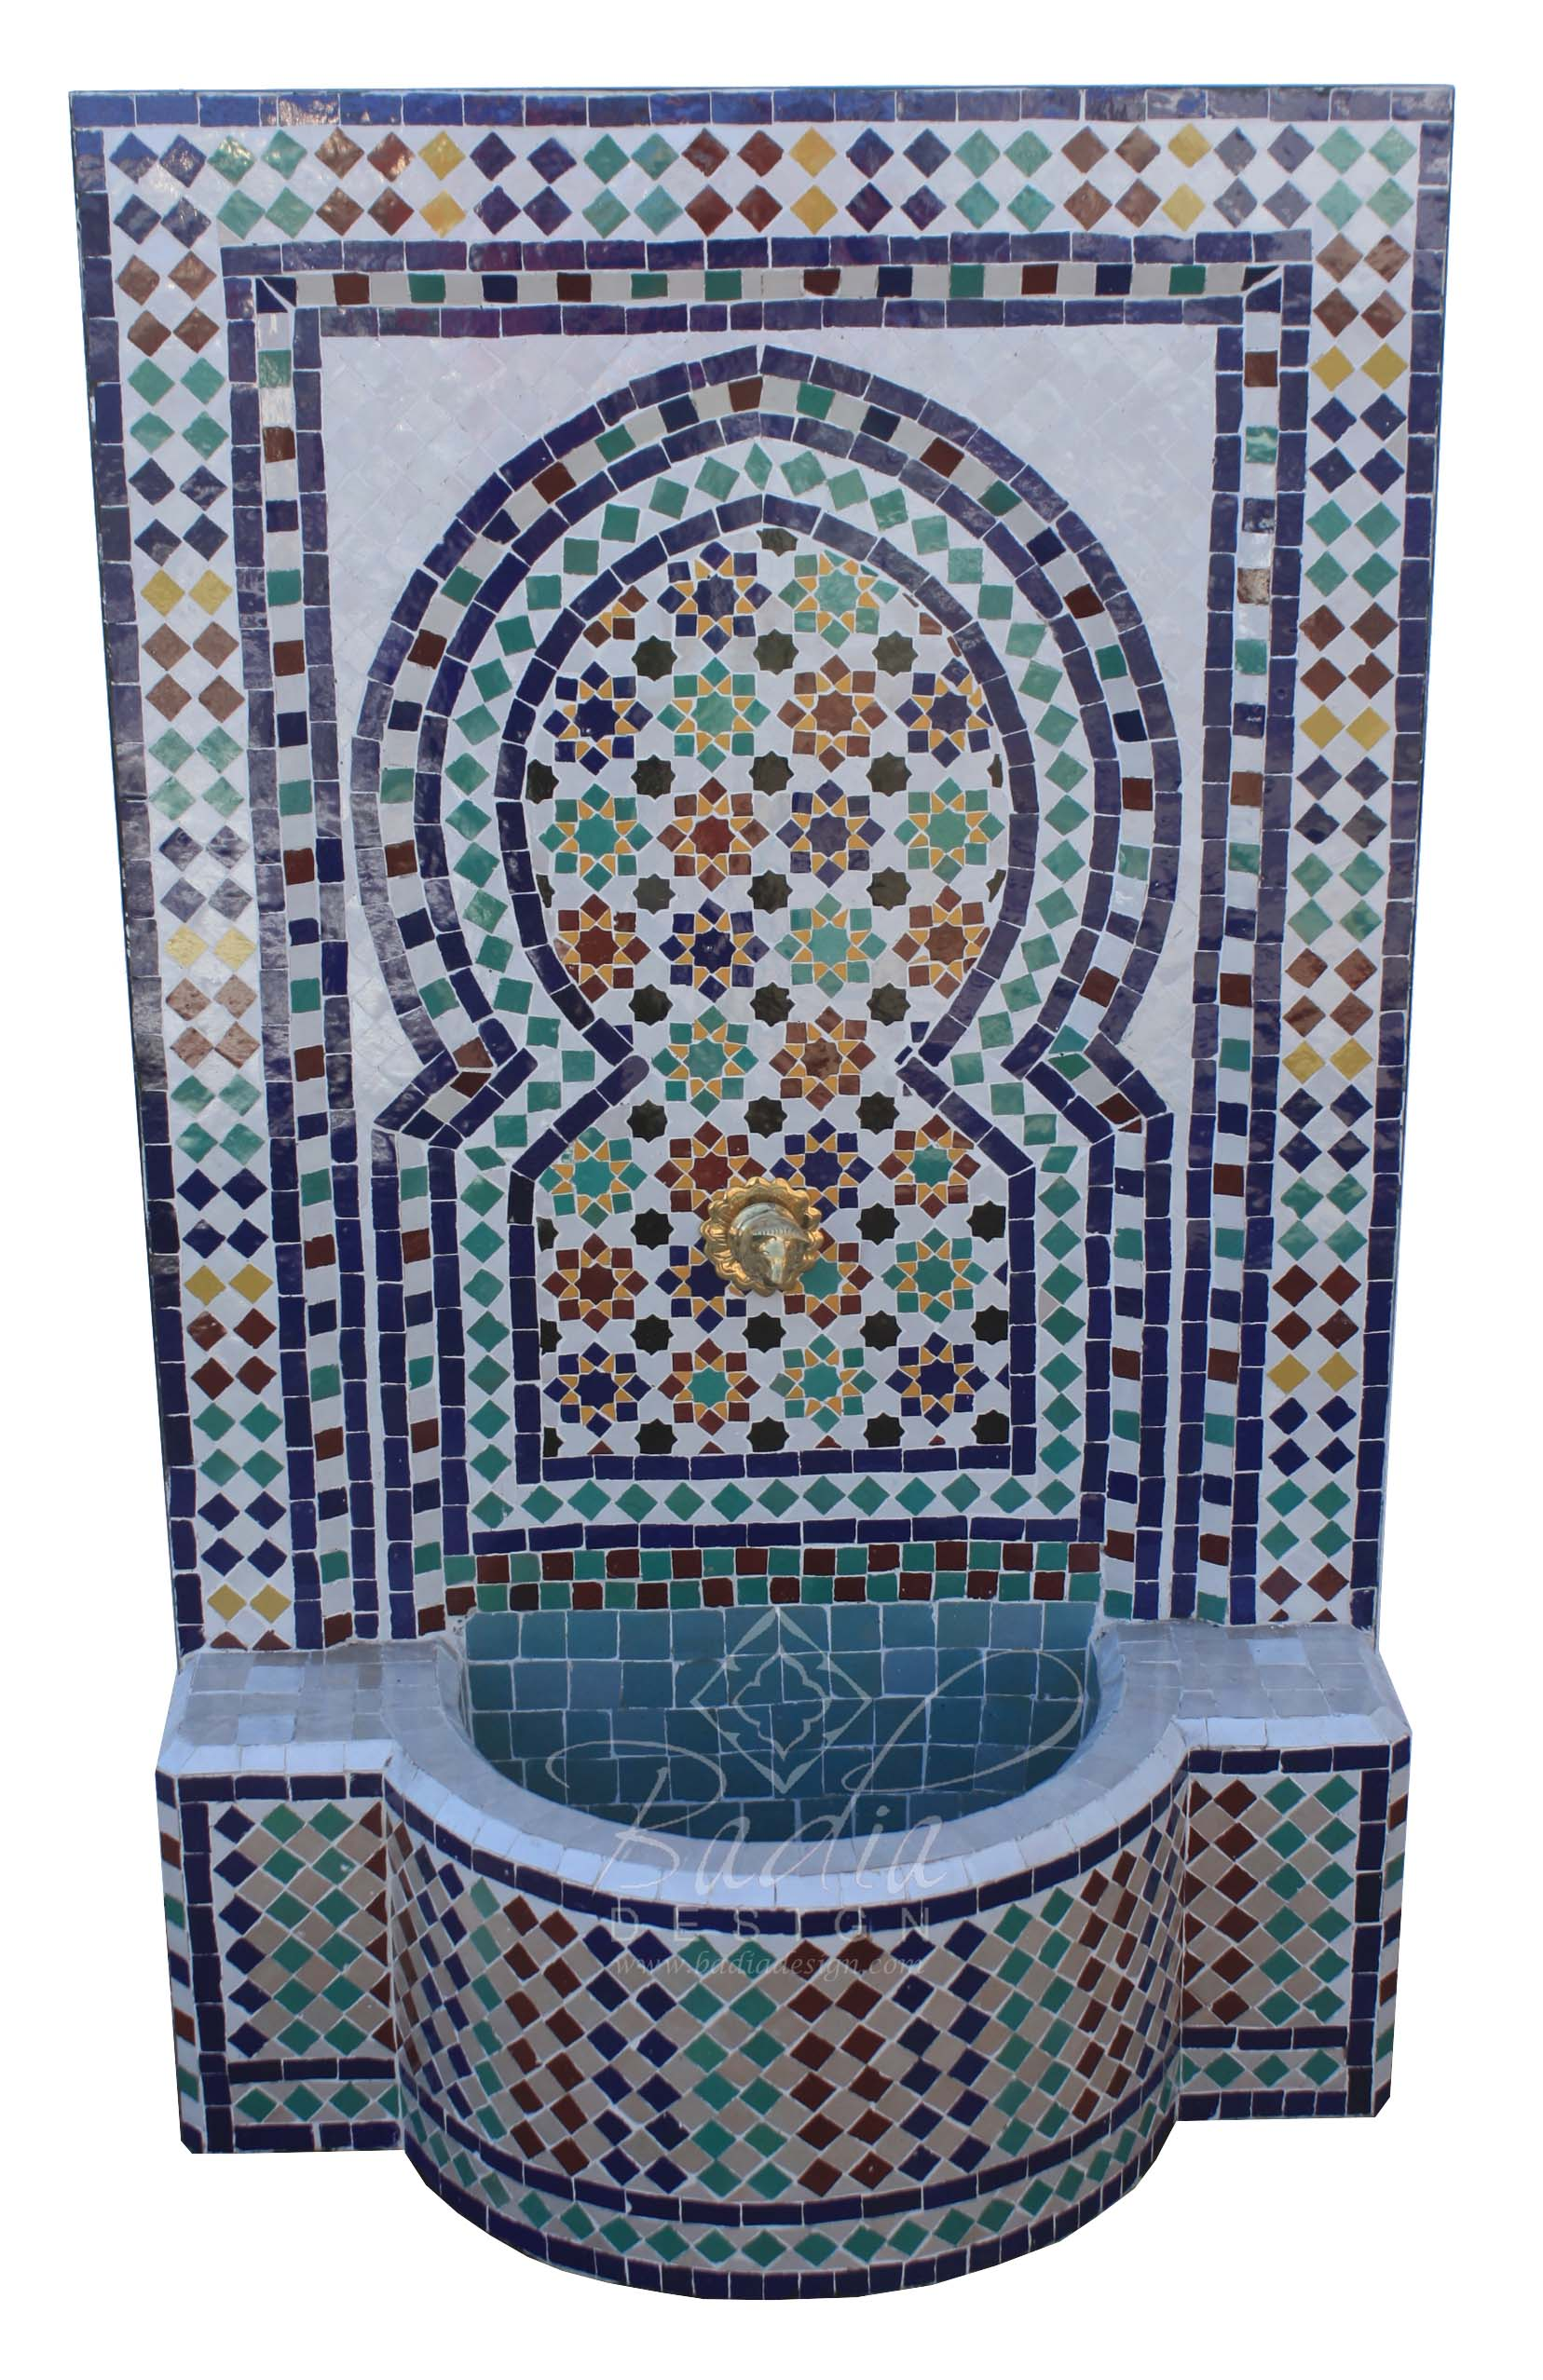 moroccan-mosaic-tile-water-fountain-mf685-1.jpg